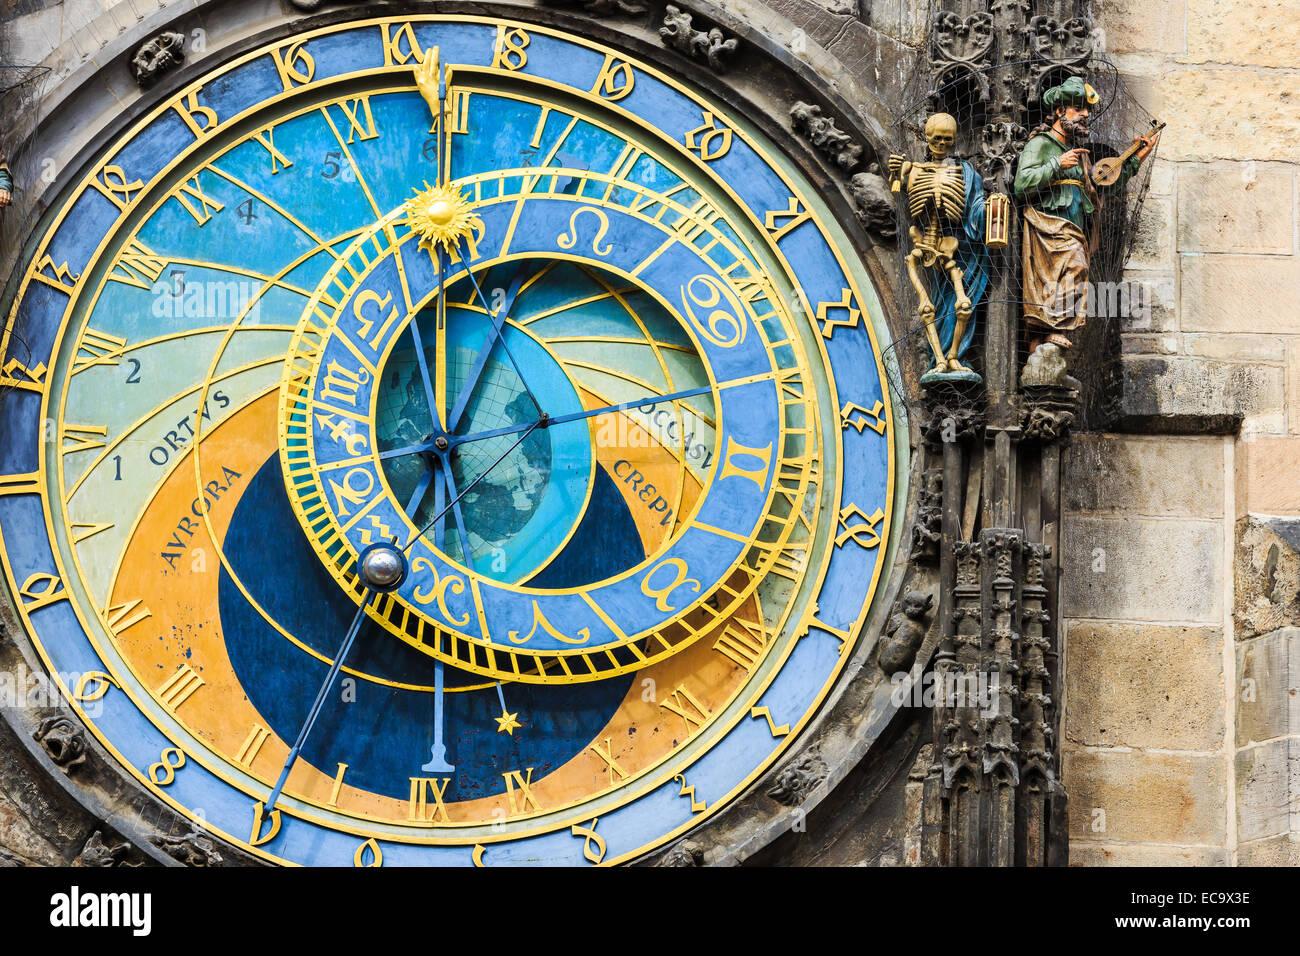 Astronomical Clock Prague, Czech Republic - Stock Image